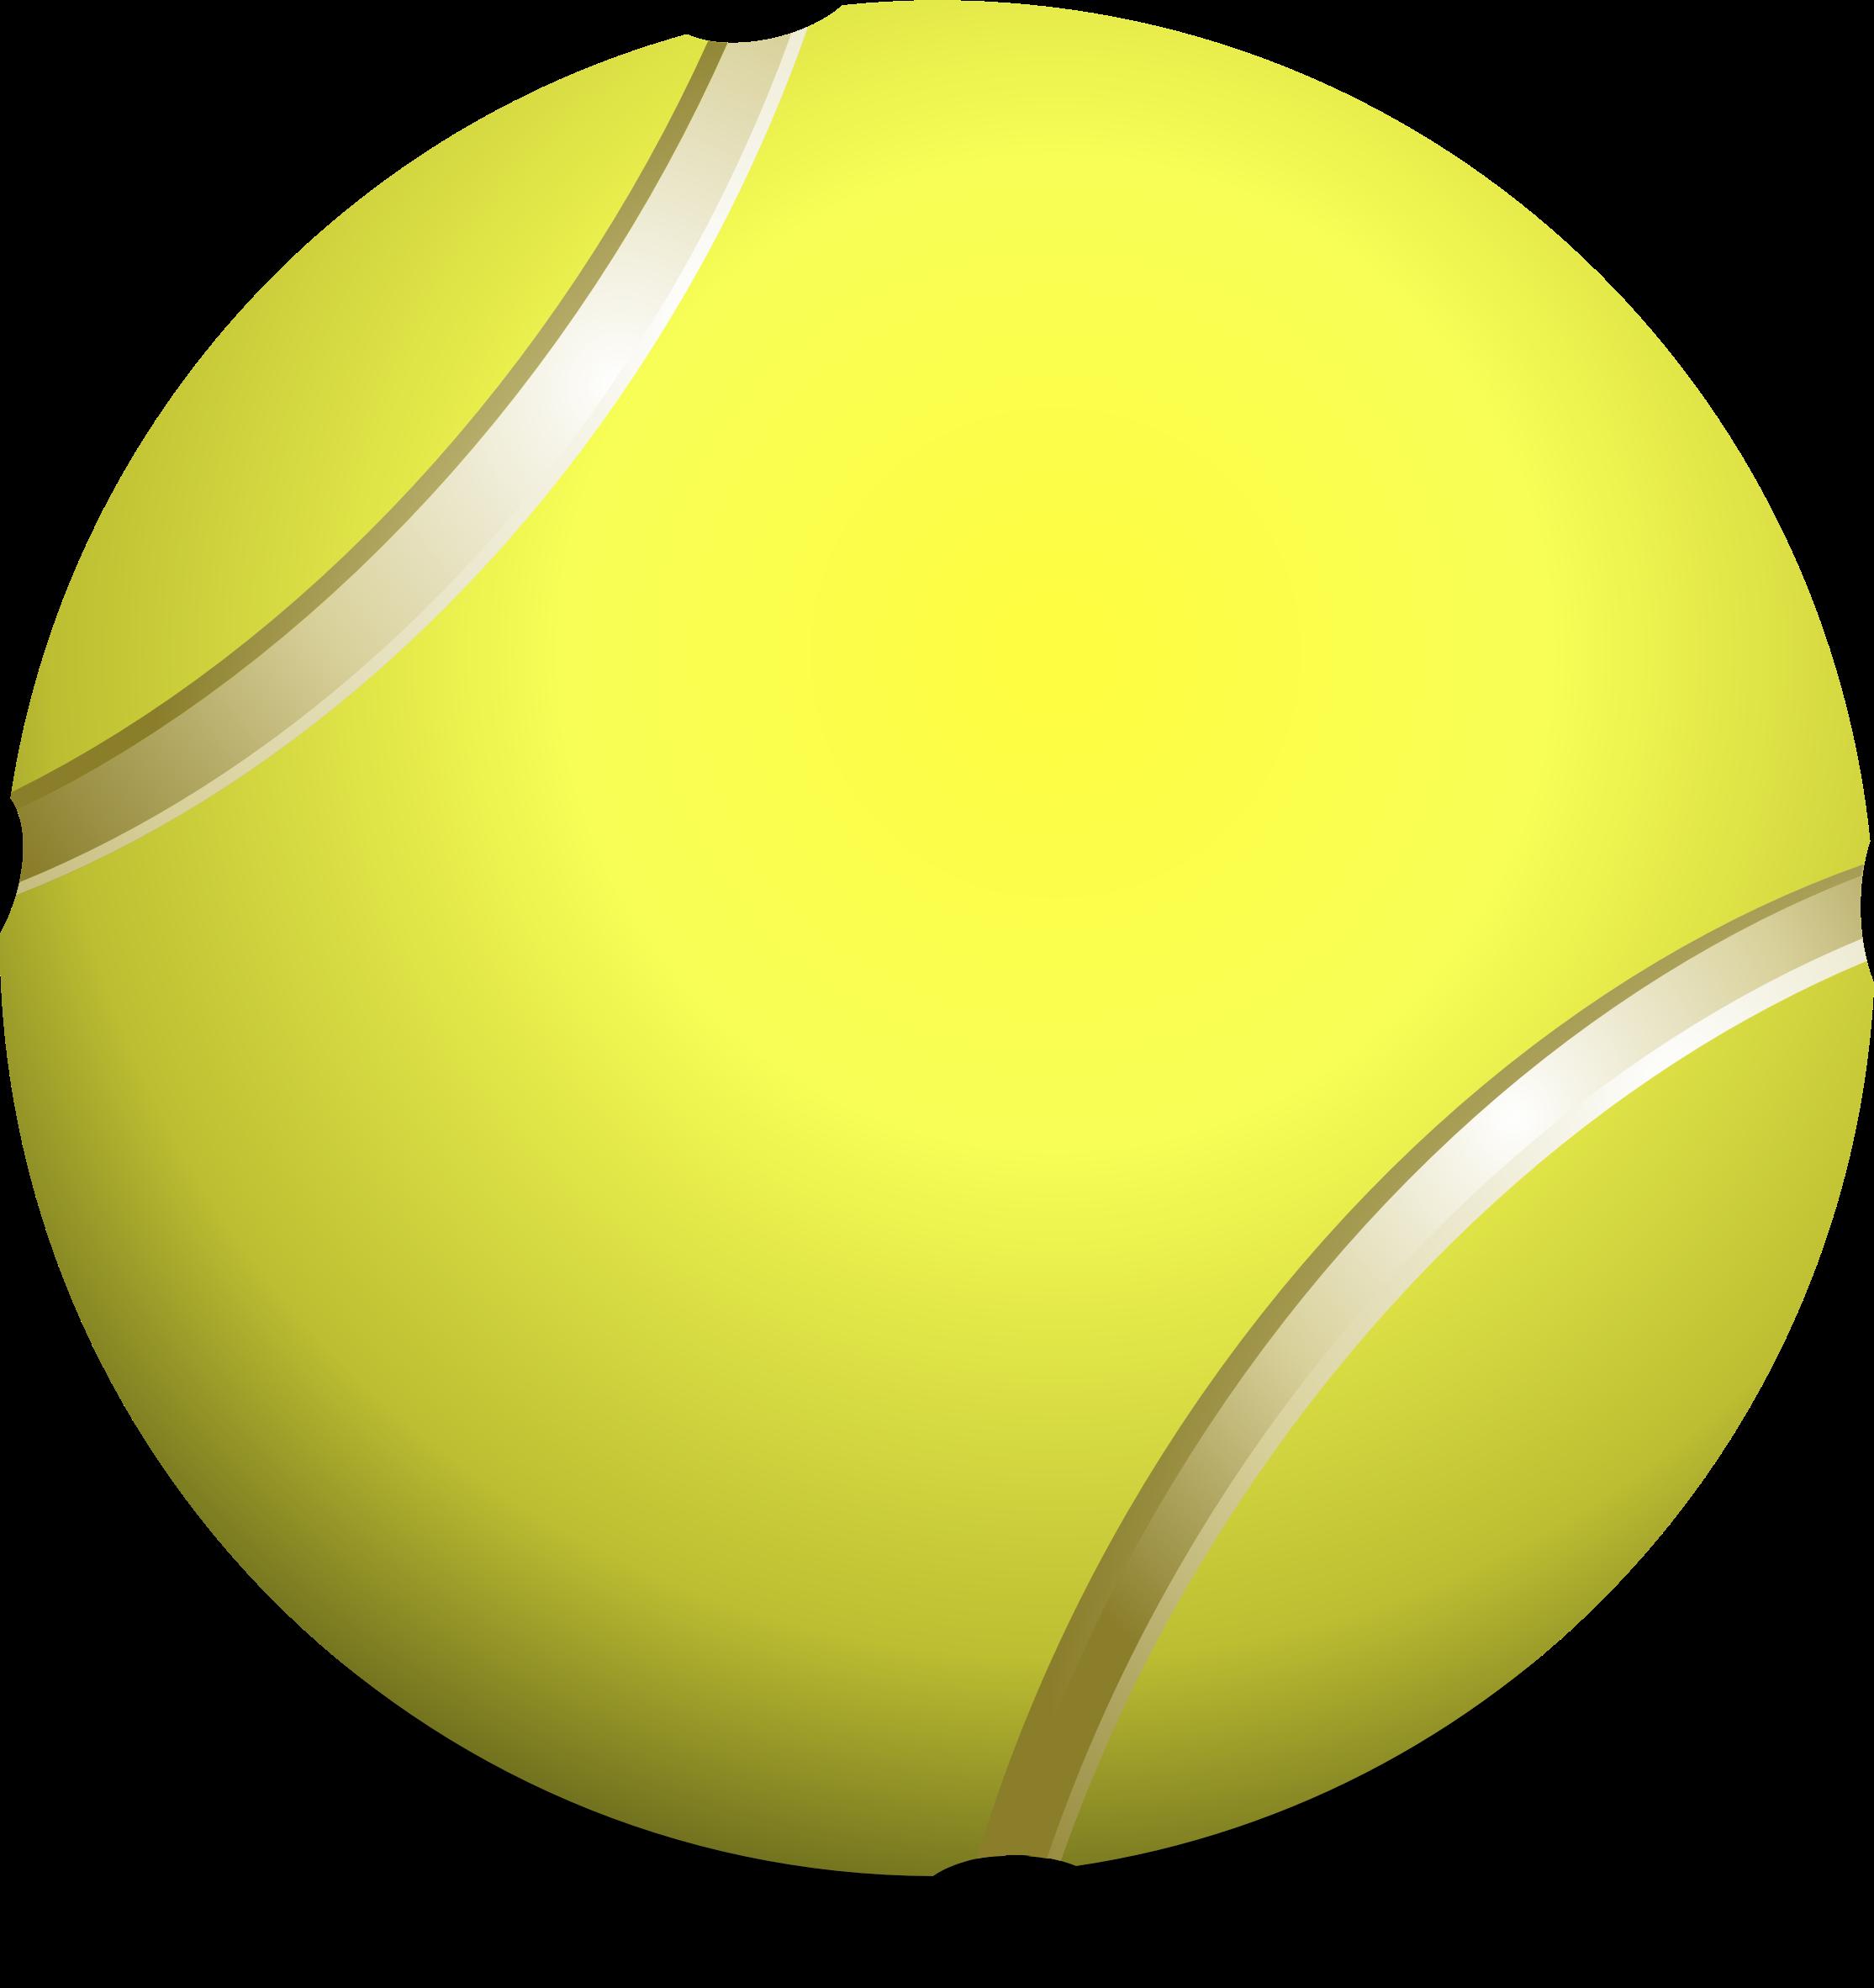 Clipart tennis ball teniso kamuoliukas-Clipart tennis ball teniso kamuoliukas-14